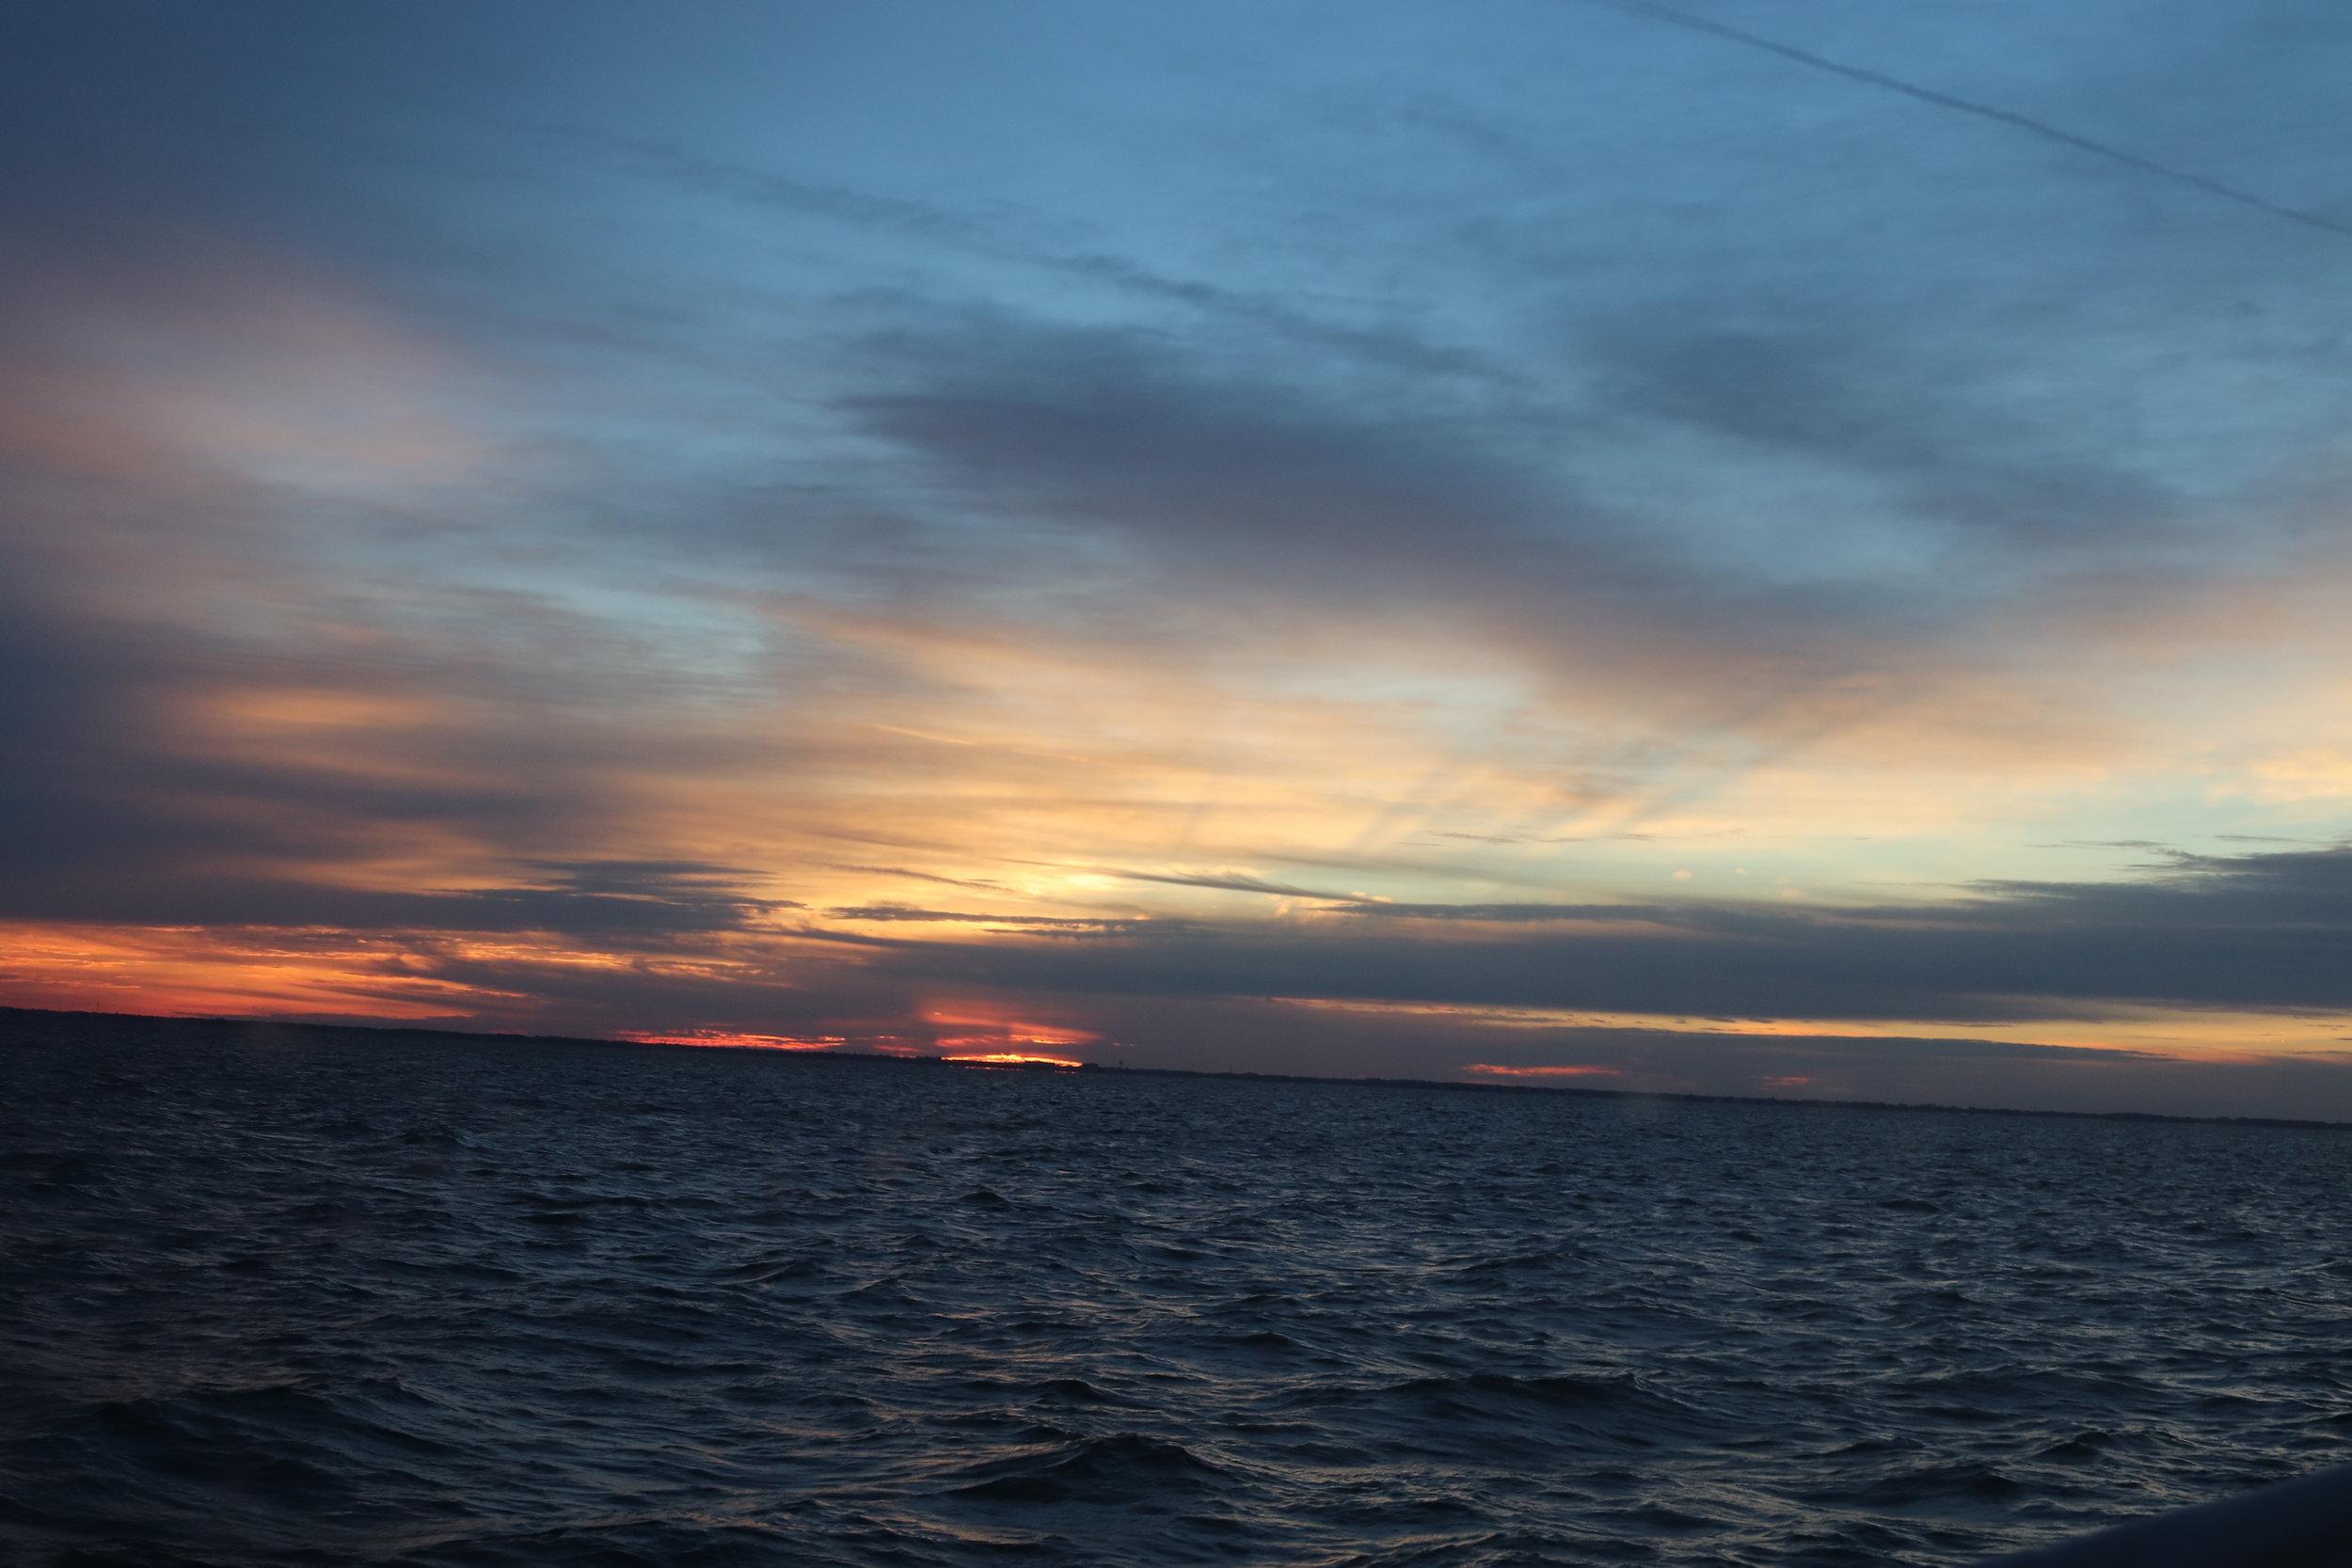 Stunning; also the start of a long dark night